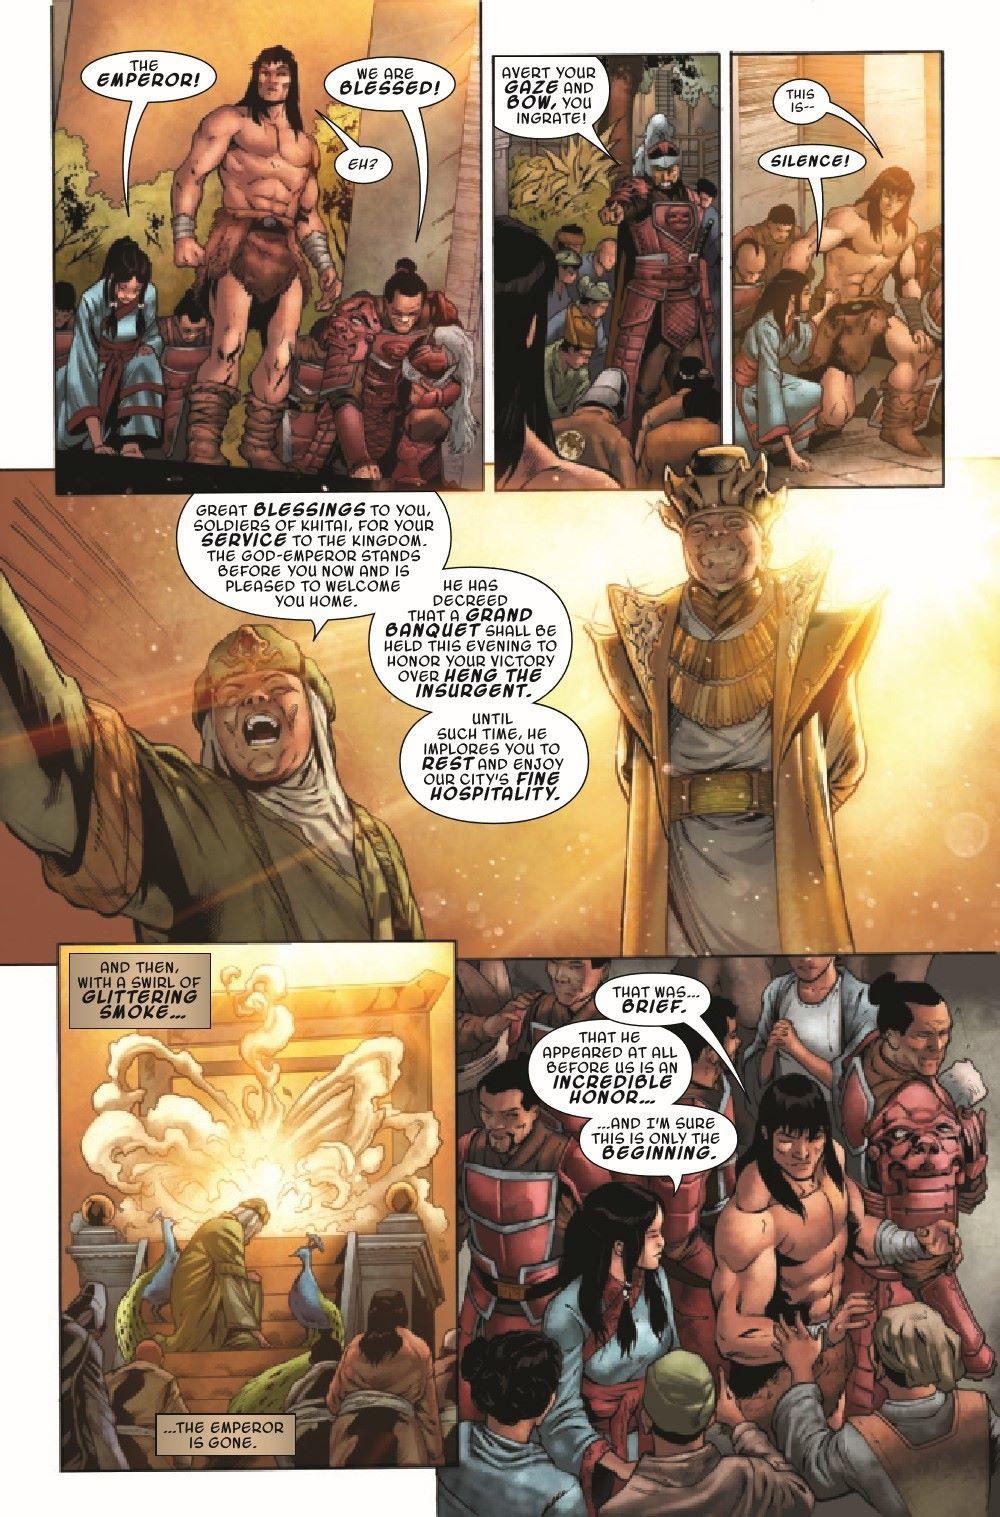 CONANBARB2019022_Preview-5 ComicList Previews: CONAN THE BARBARIAN #22